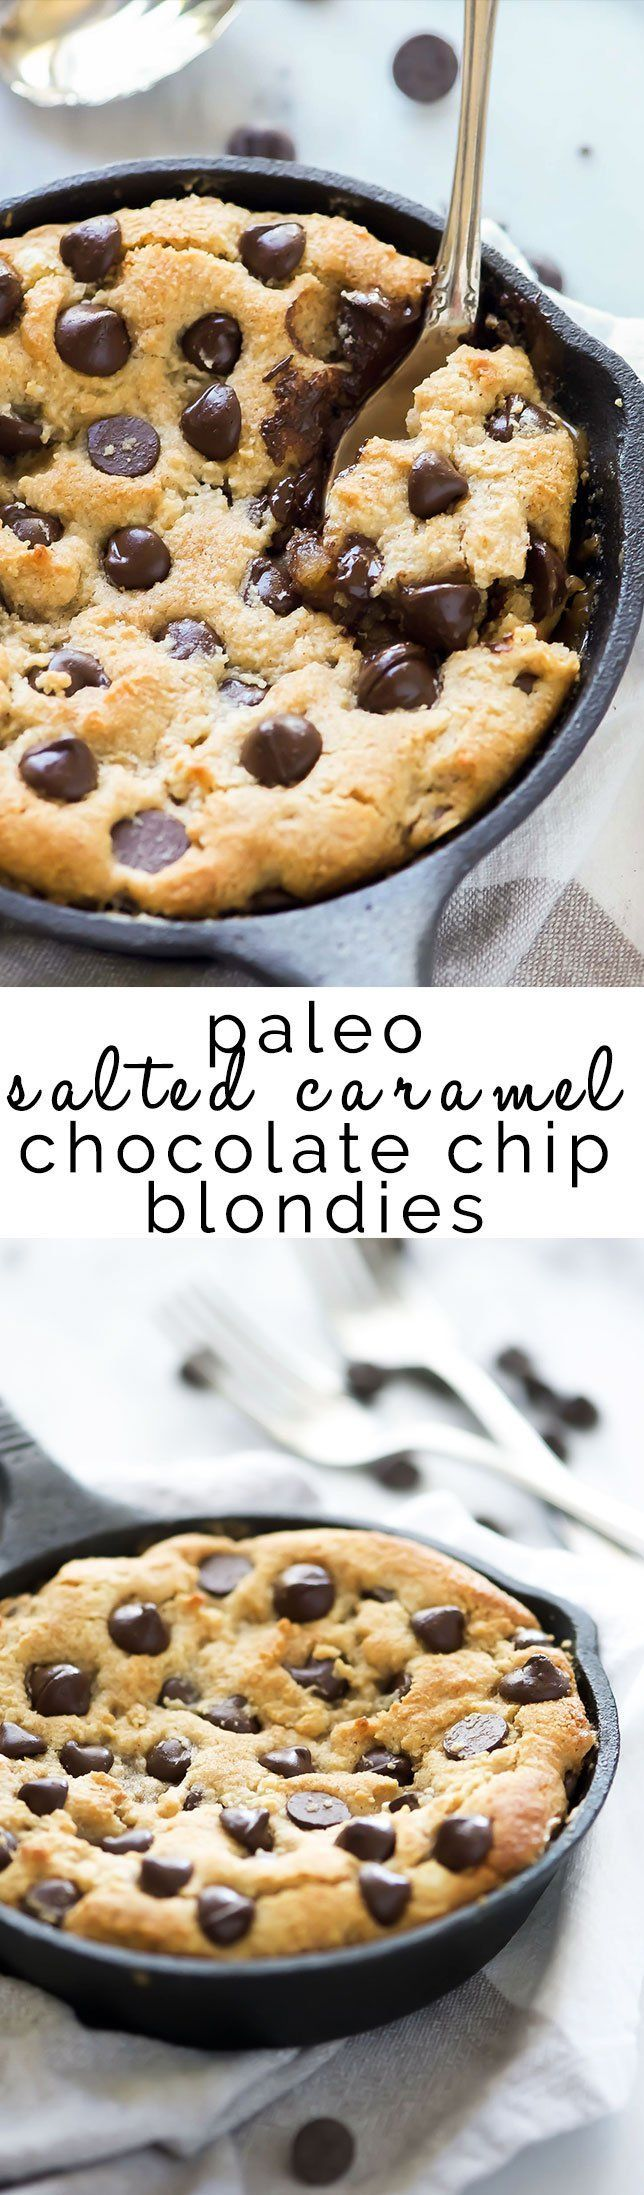 Paleo Salted Caramel Chocolate Chip Blondies | Easy, Best, Fudgy, Flourless, Recipe, Dairy Free, Healthy,